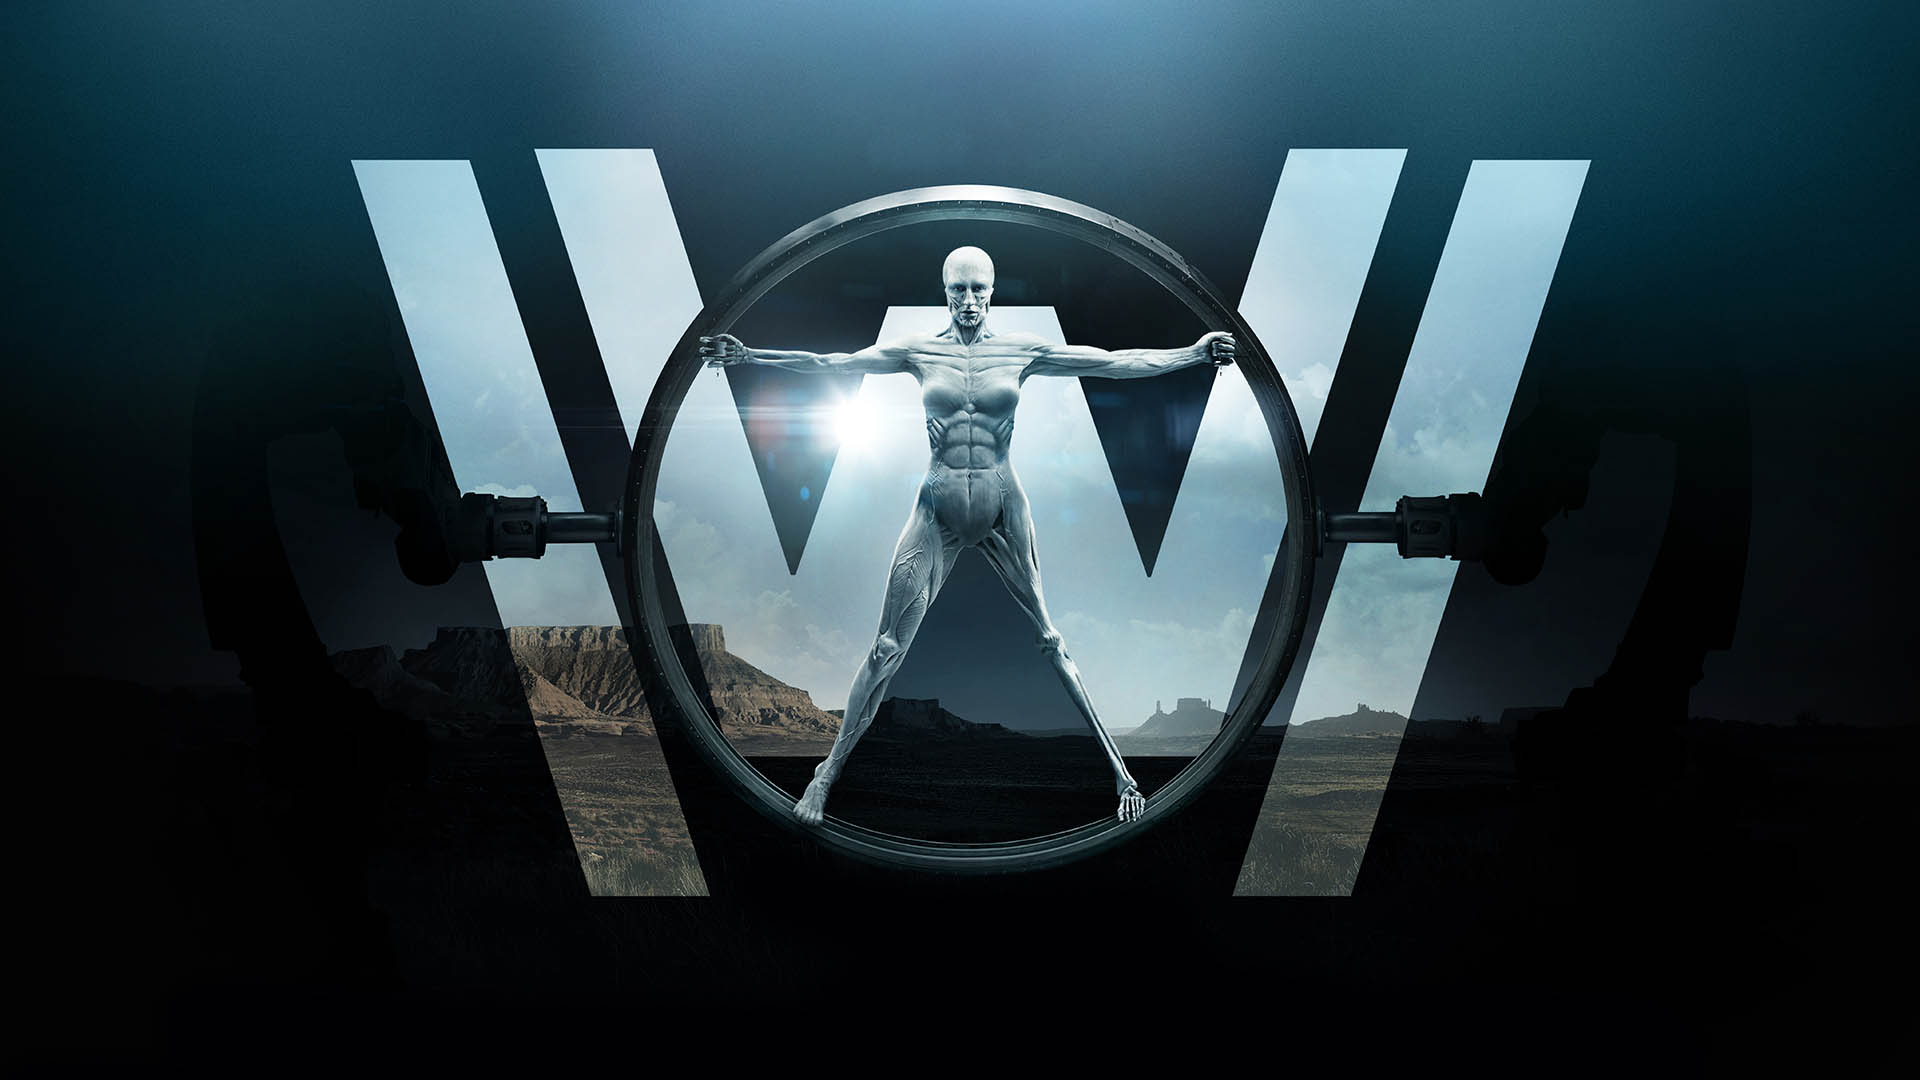 HBO Westworld poster